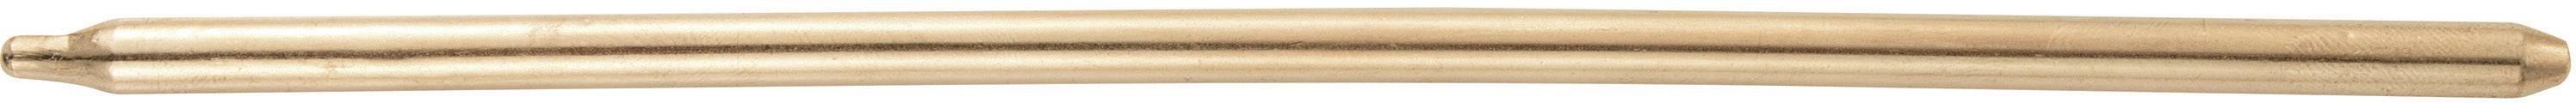 Teplovodná trubka Gelid CP-S6200-01, (Ø x d) 6 mm x 200 mm, měď, voda